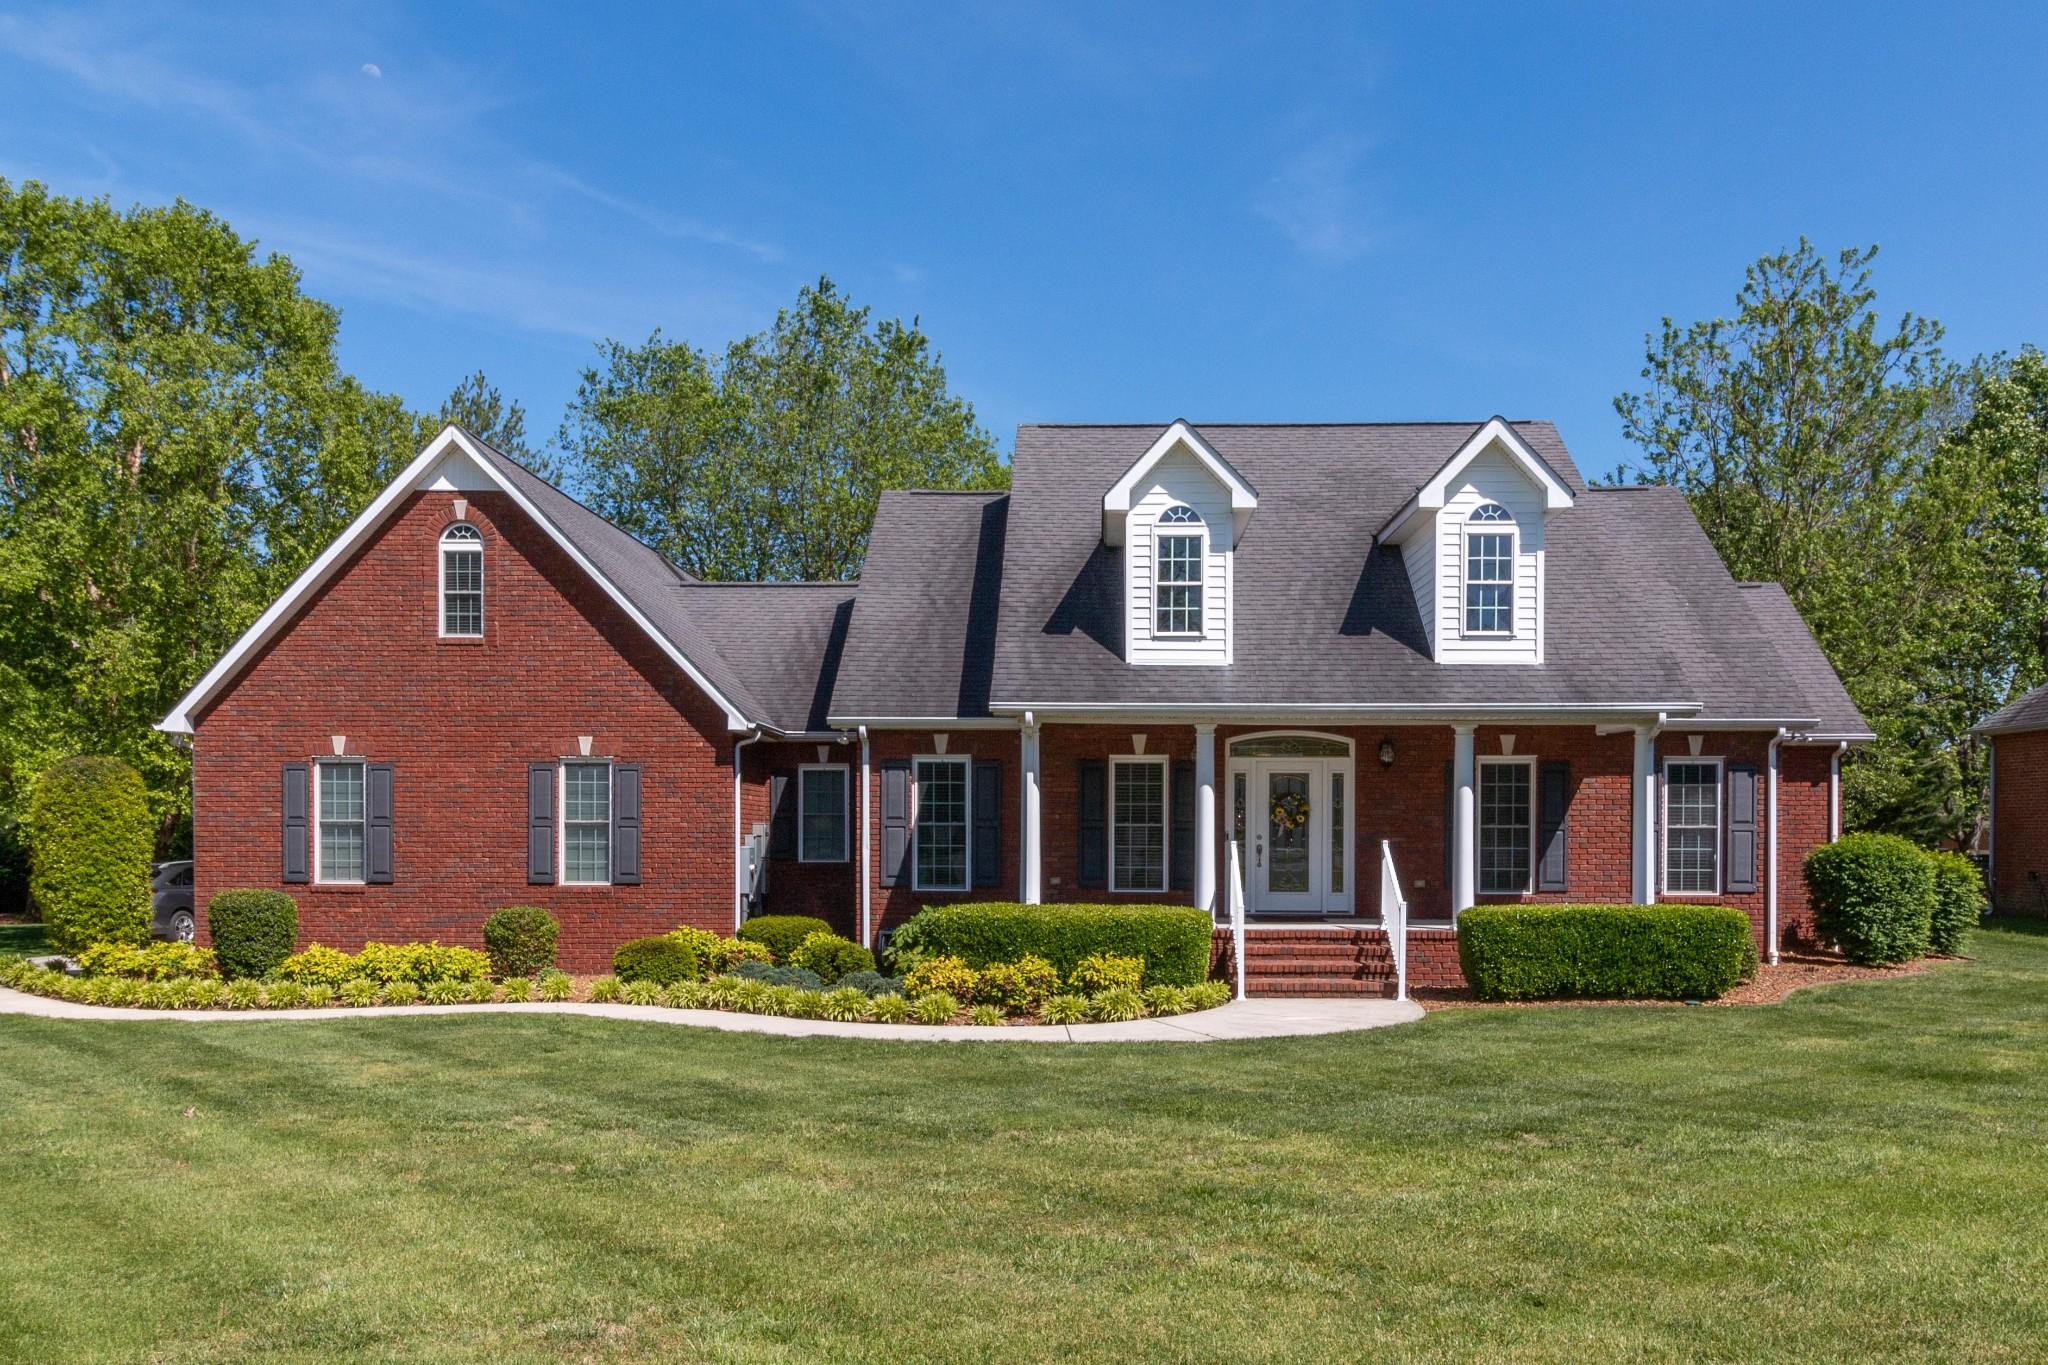 2100 Ovoca Rd, Tullahoma, TN 37388 - Tullahoma, TN real estate listing